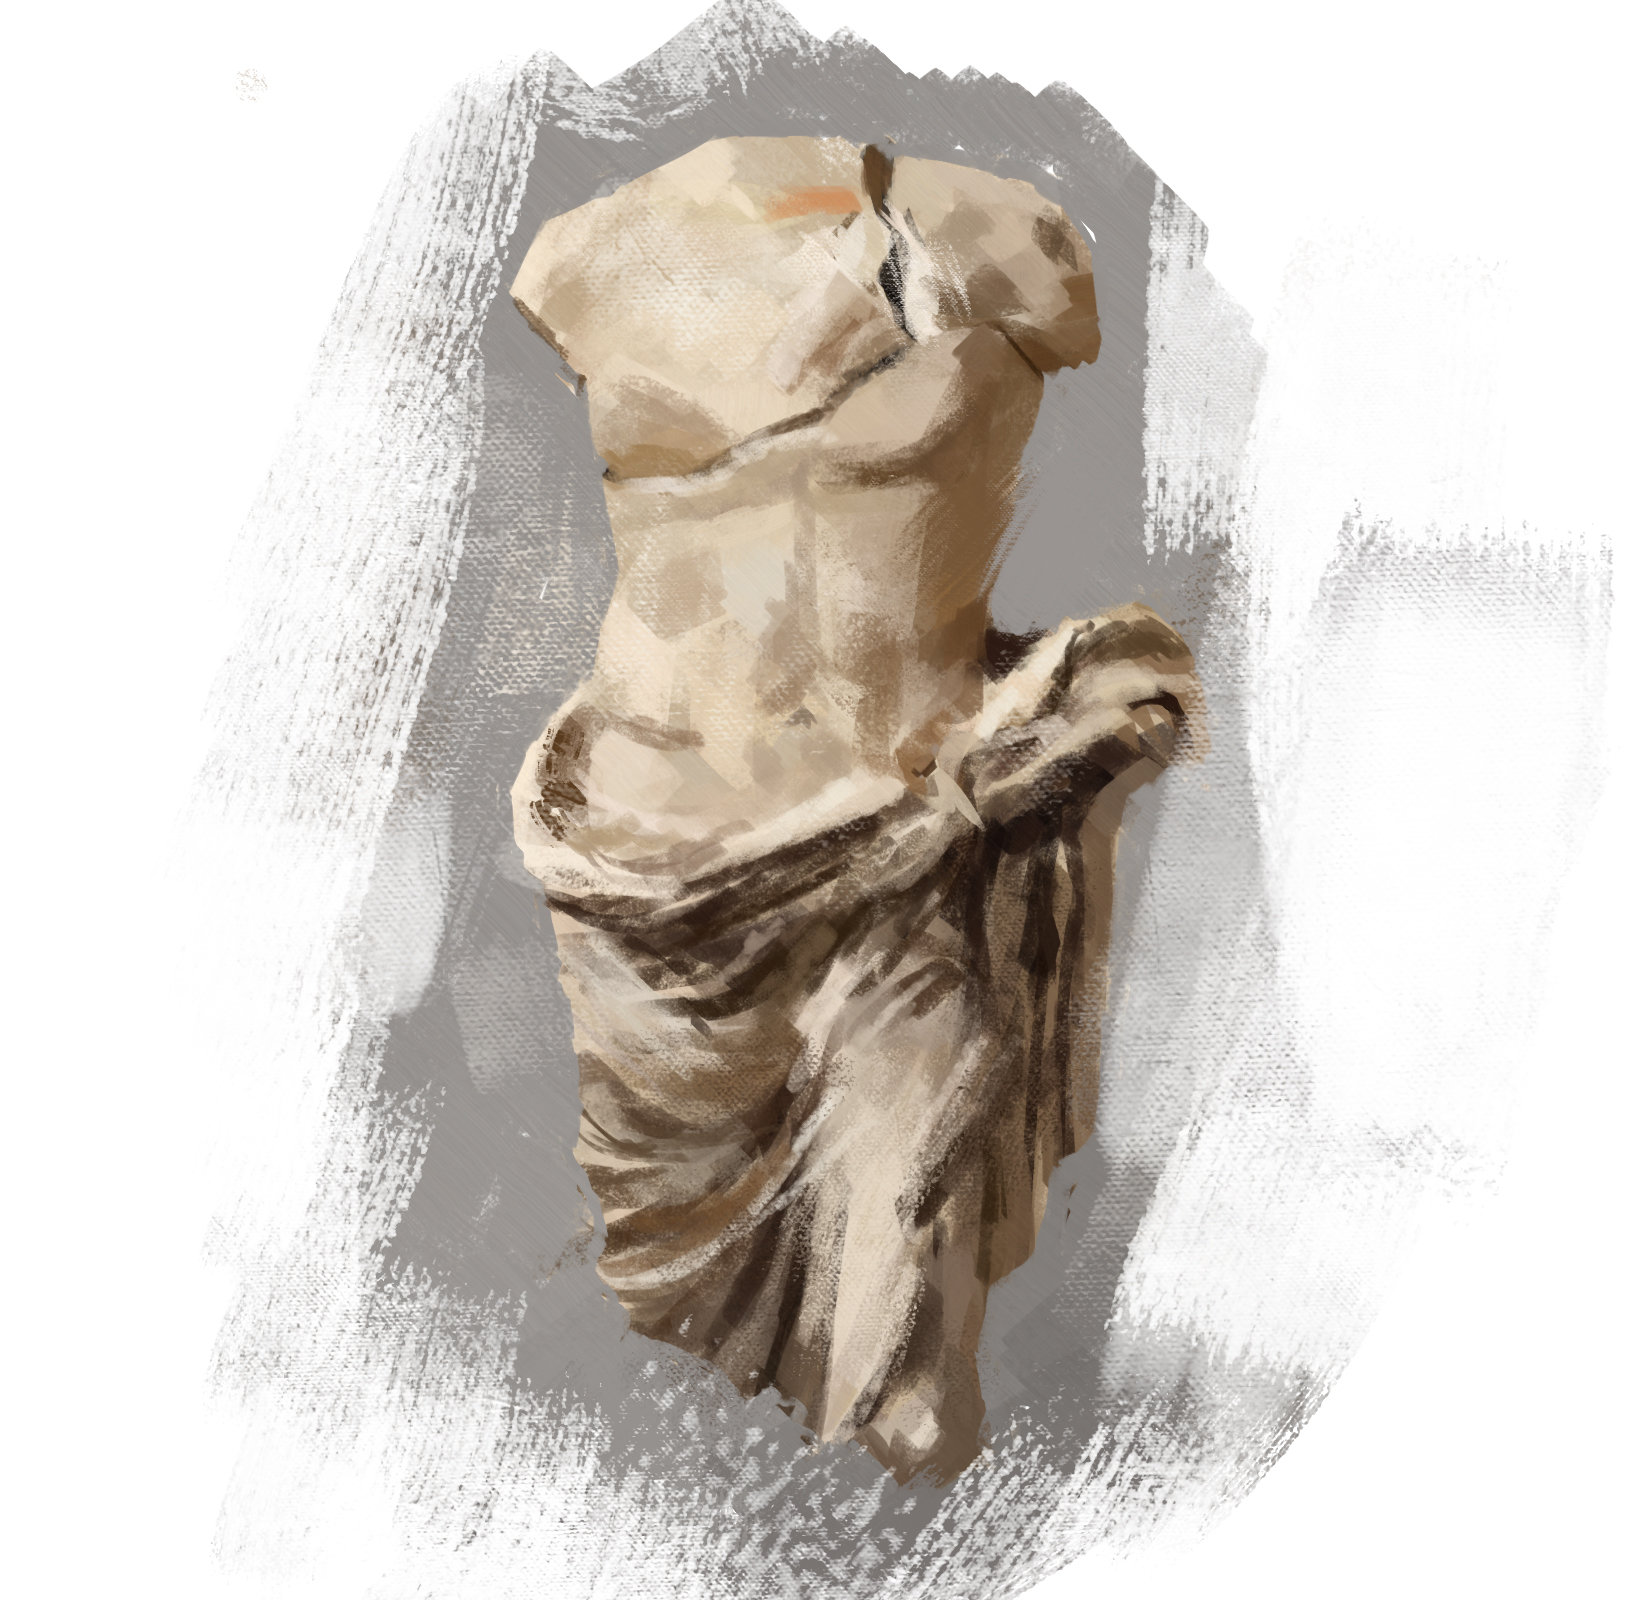 Konrad langa day2 3 roman bust